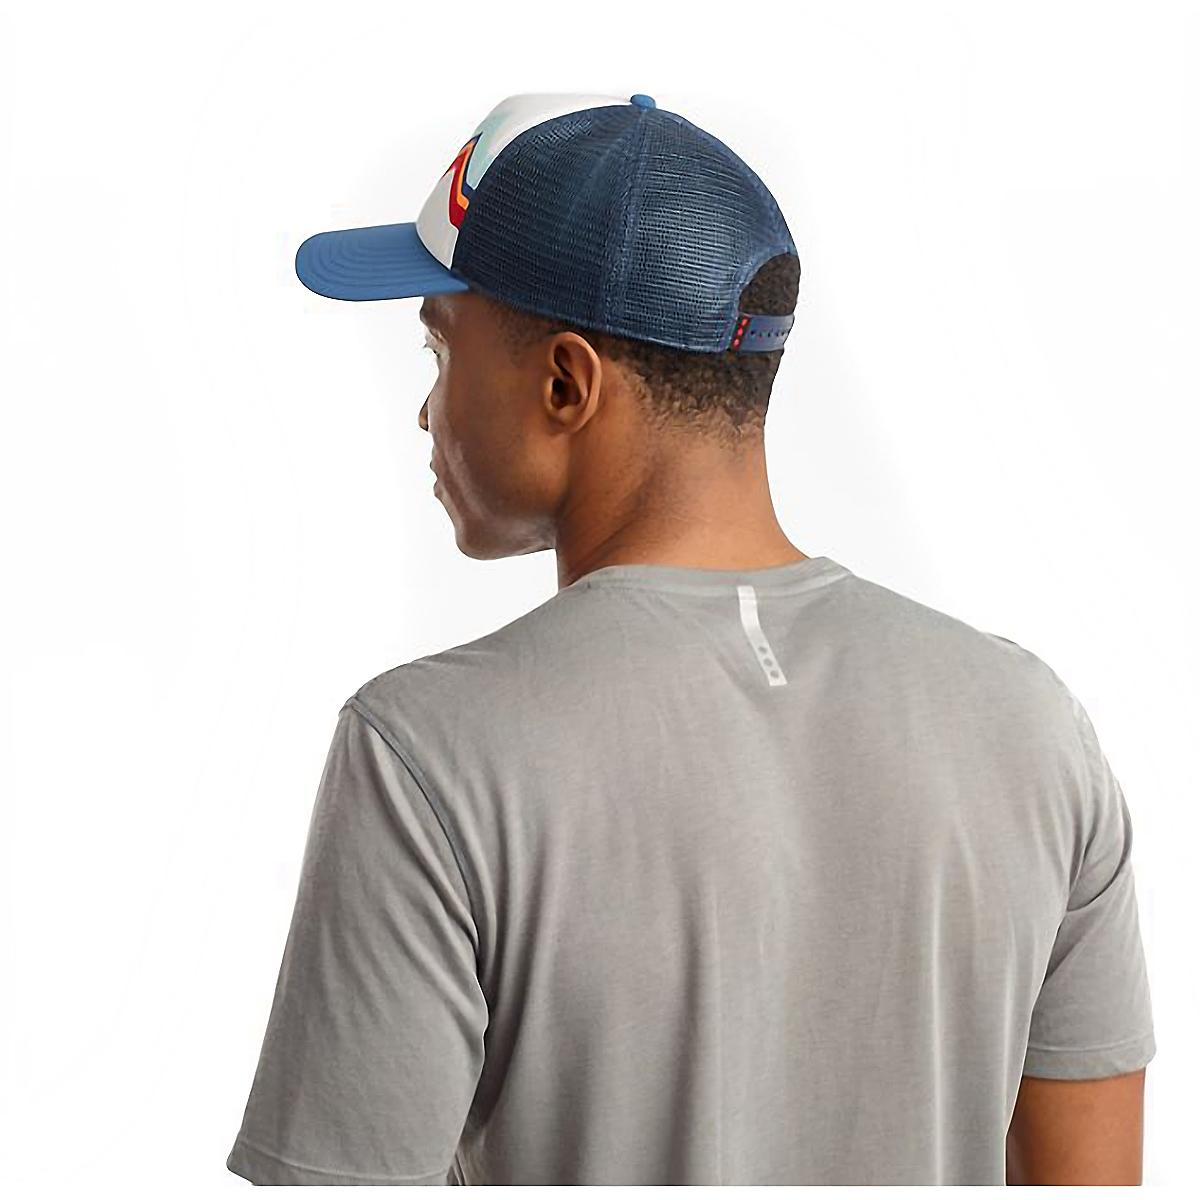 Saucony Foam Trucker Hat - Color: White, White, large, image 4